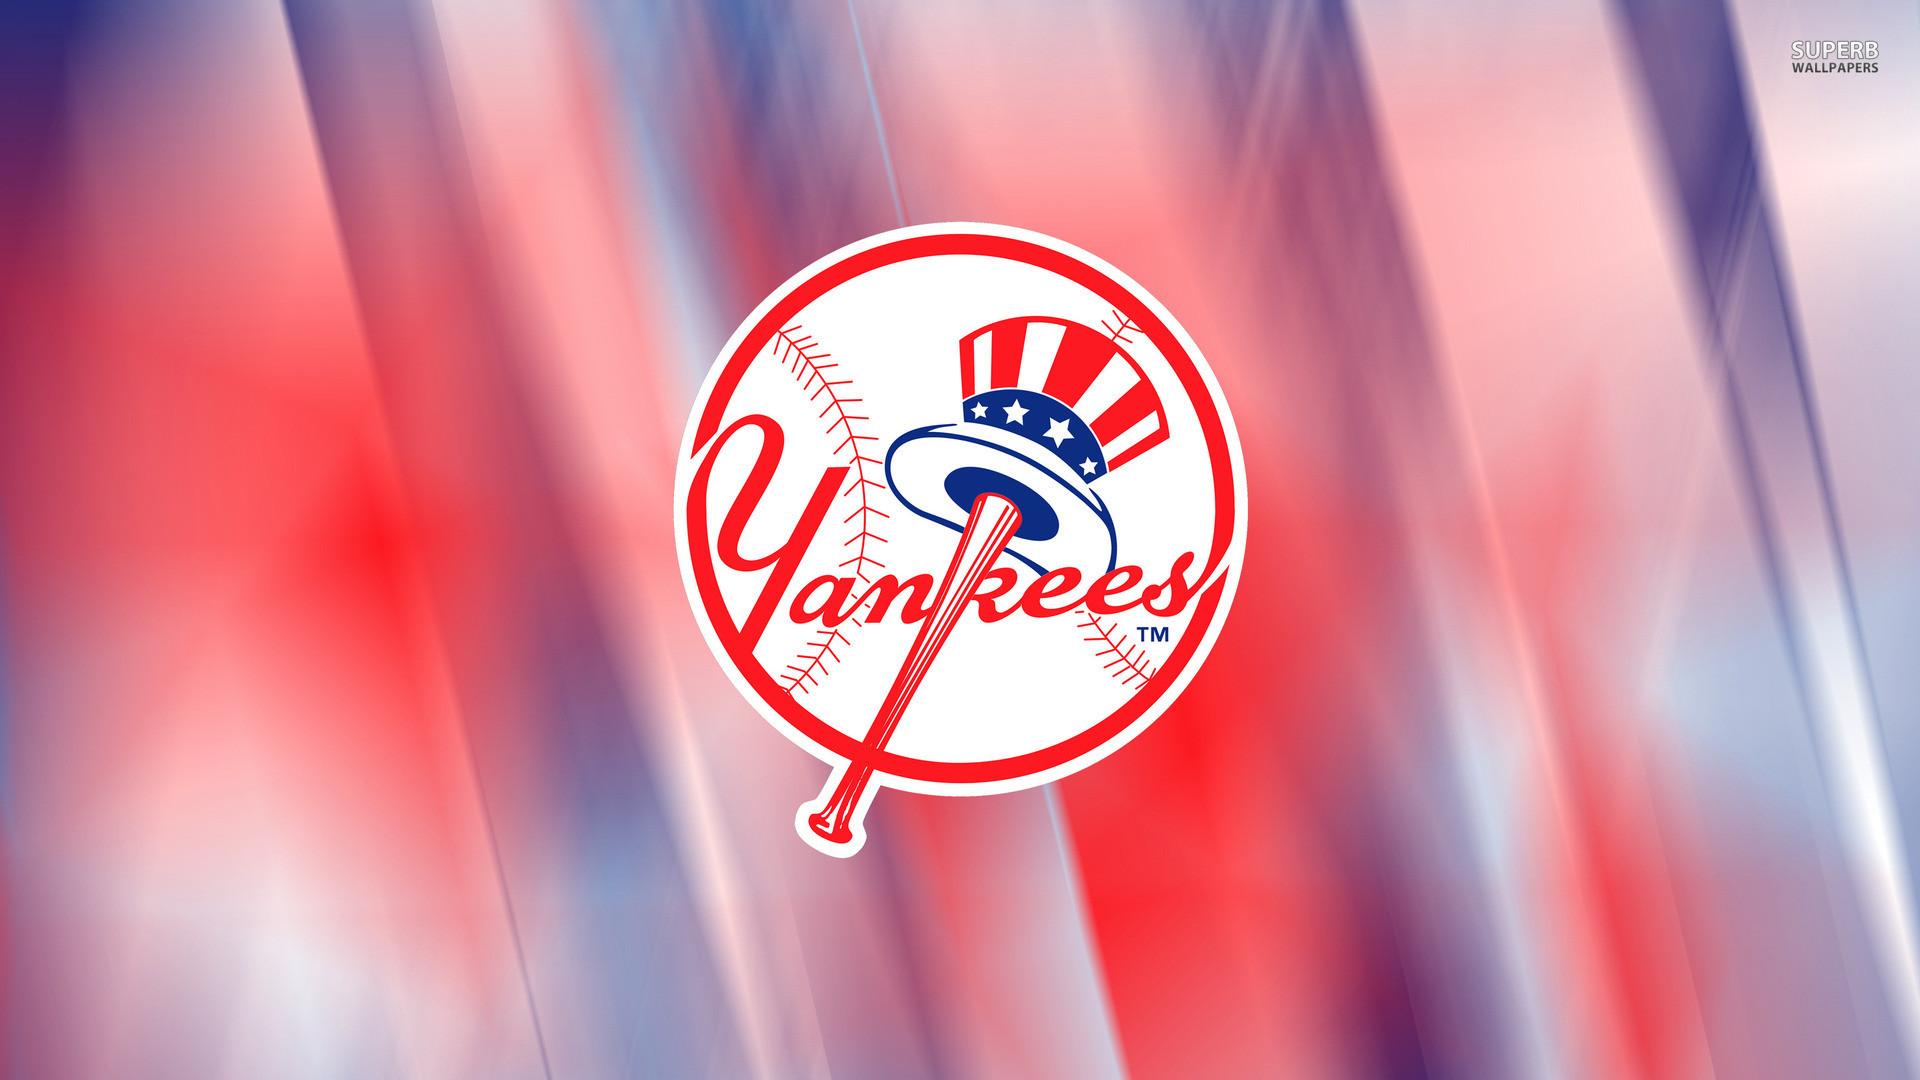 1920x1080 Wallpaperwiki Great New York Yankees Wallpaper PIC